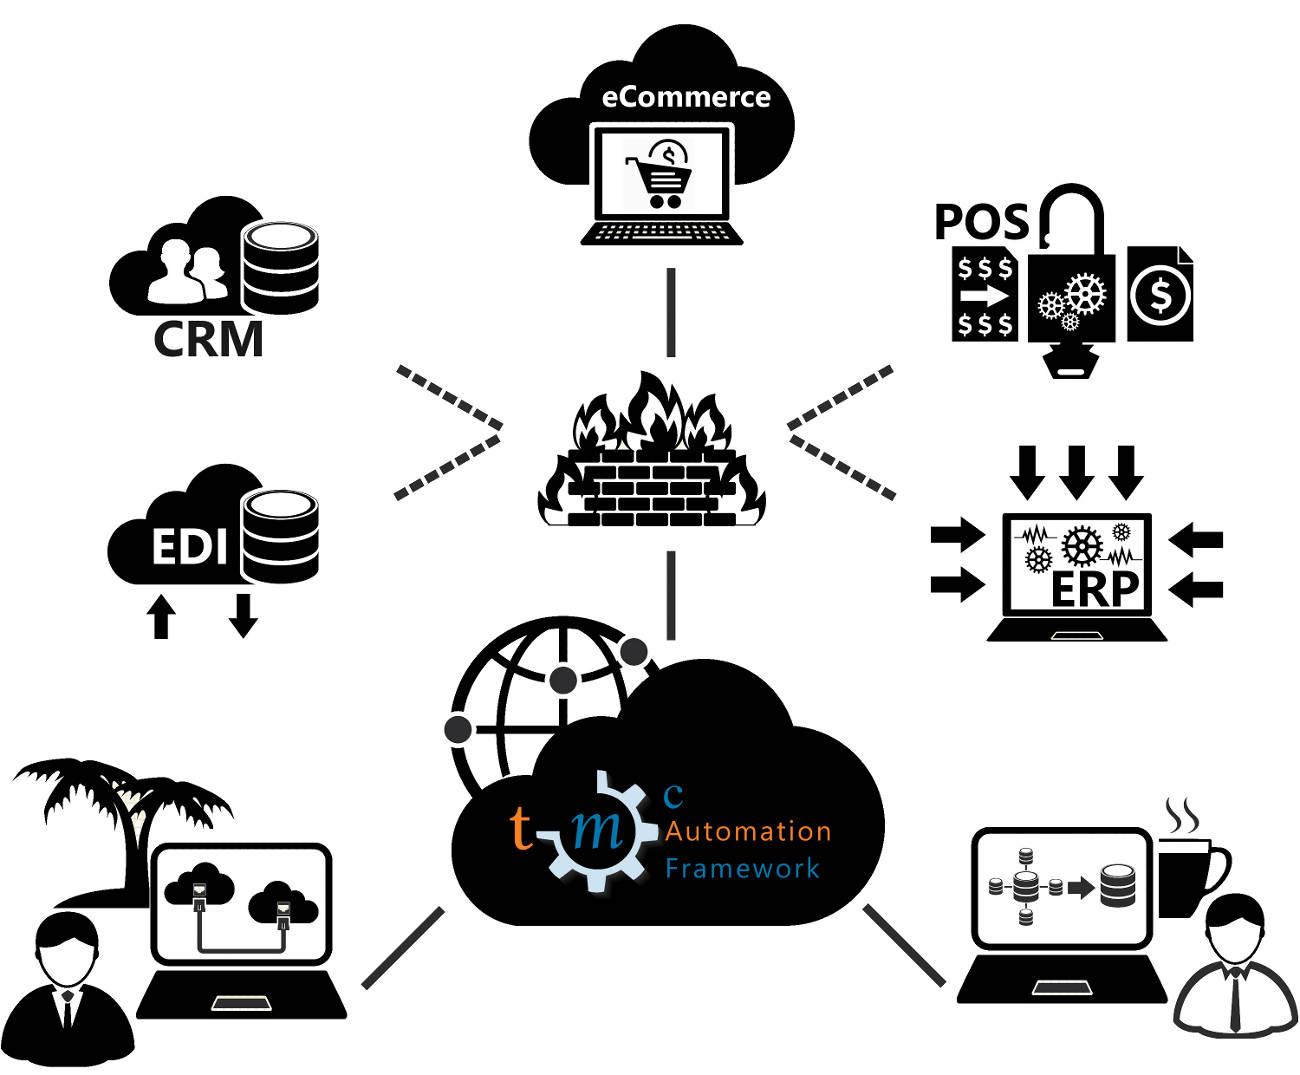 TMC Automation Framework